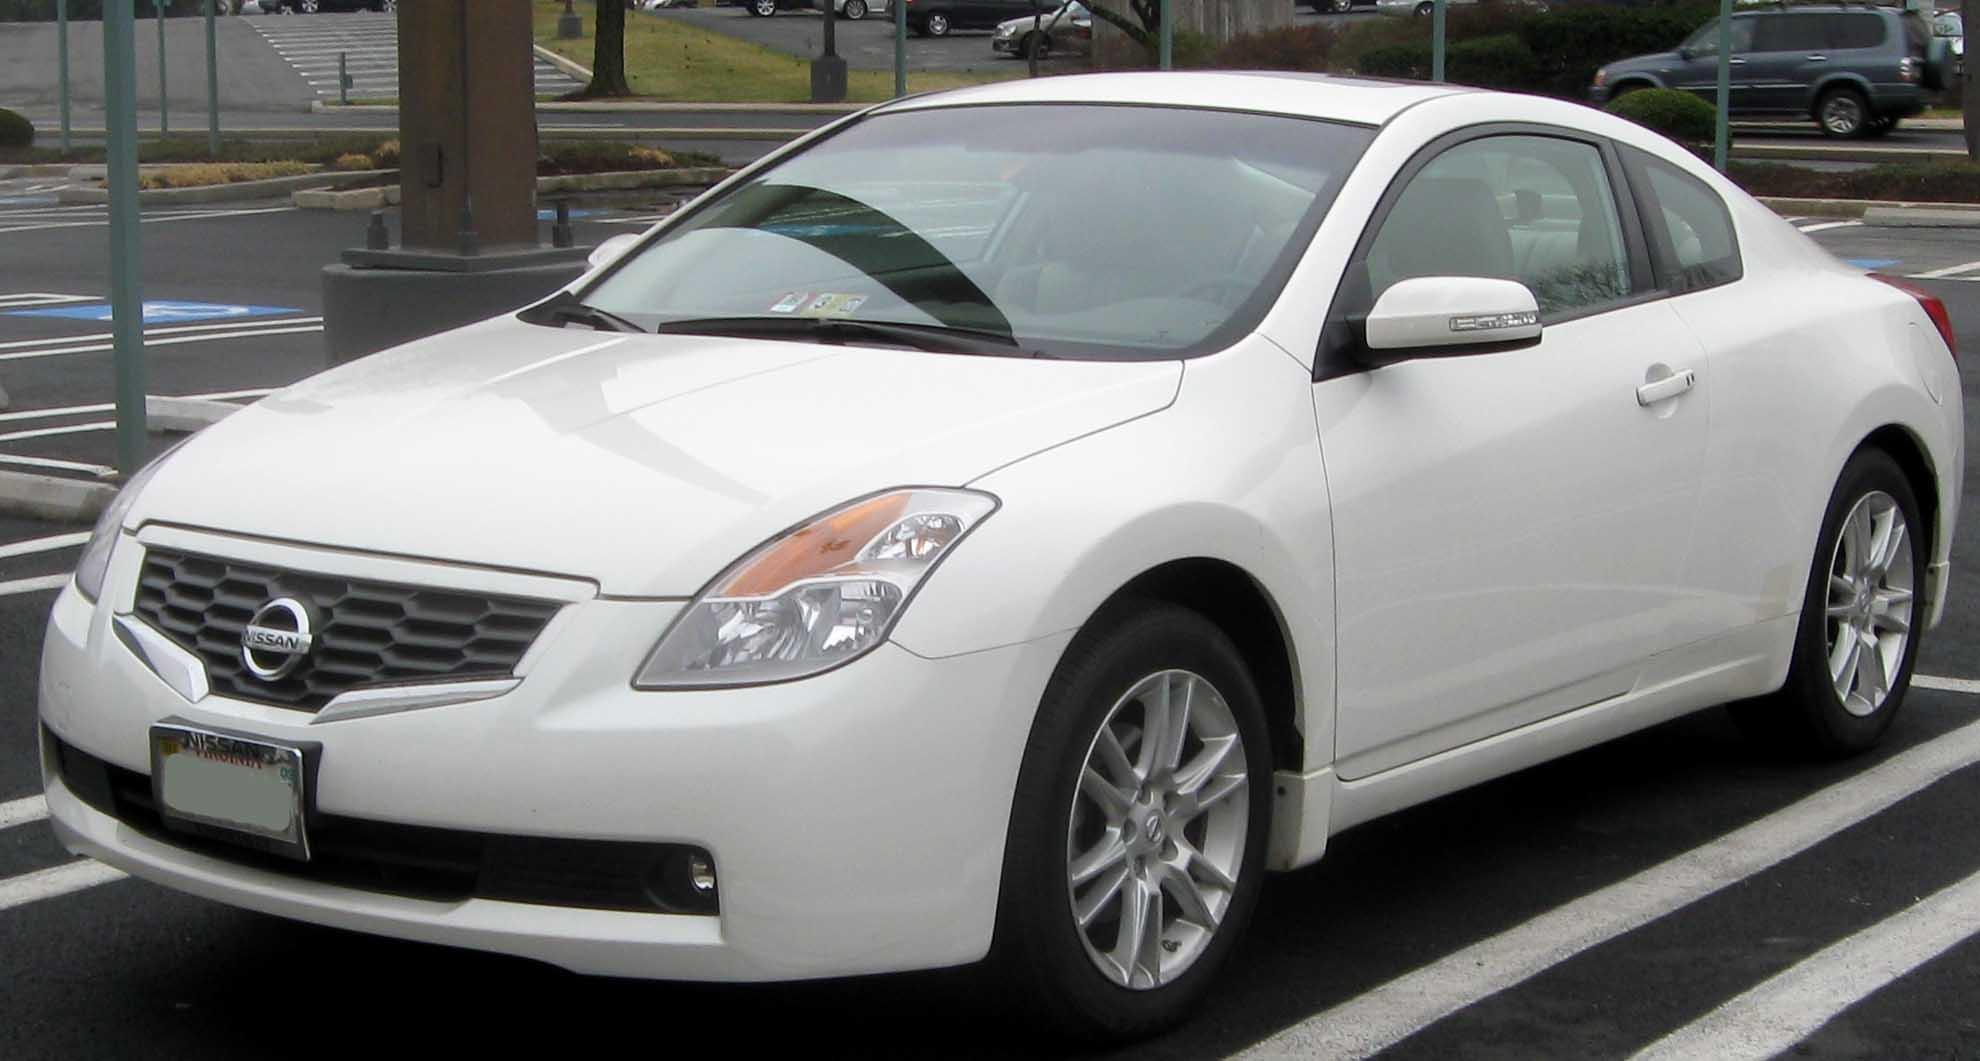 new altima north of nissan mall coast used auto s at coupe sedan